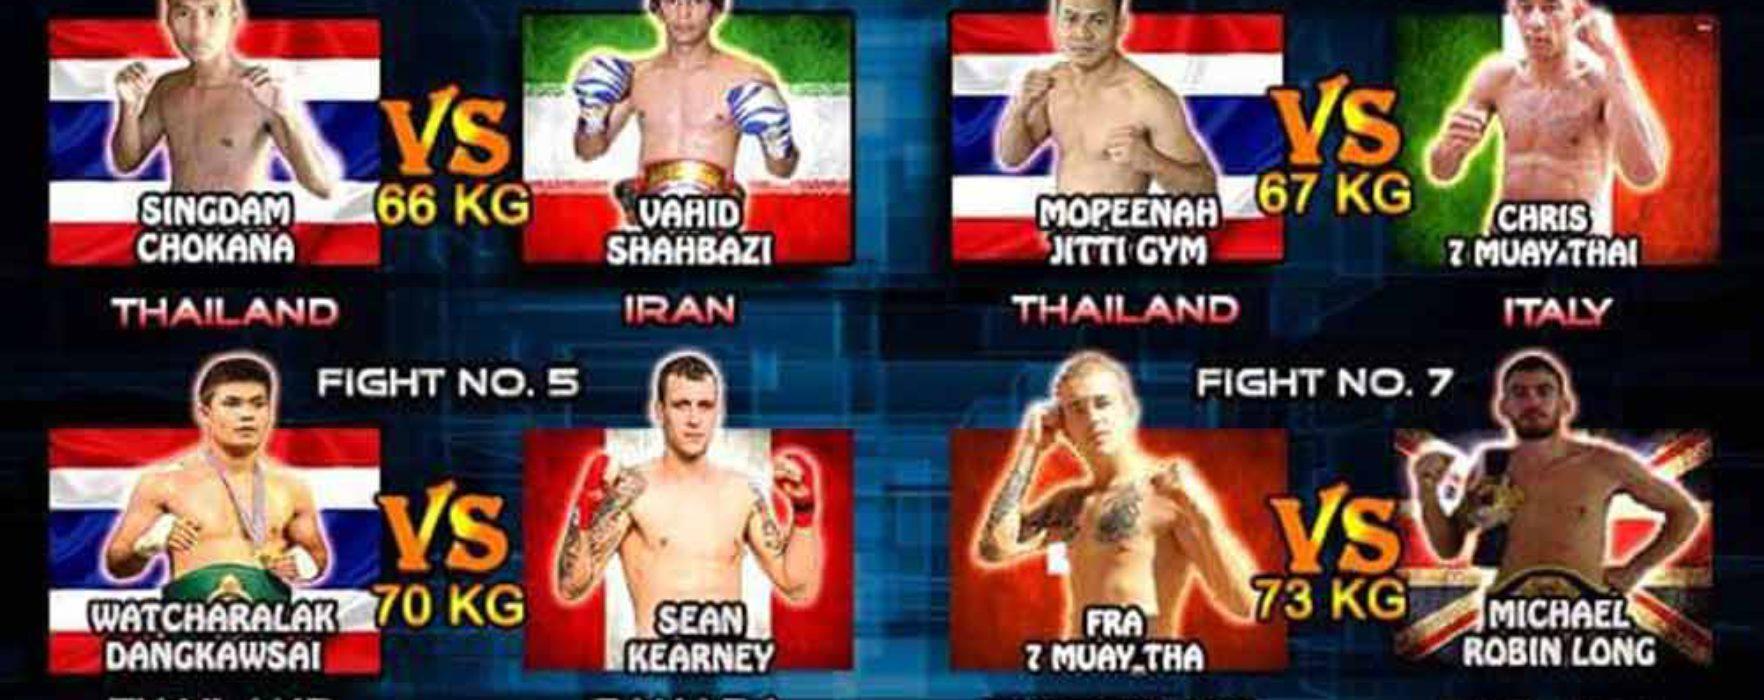 (English) Card / Streaming: Christian Zahe, Sean Kearney, Vahid Shahbazi,  Jahongir Muhammadi etc at Super Muay Thai | 15 My 2016